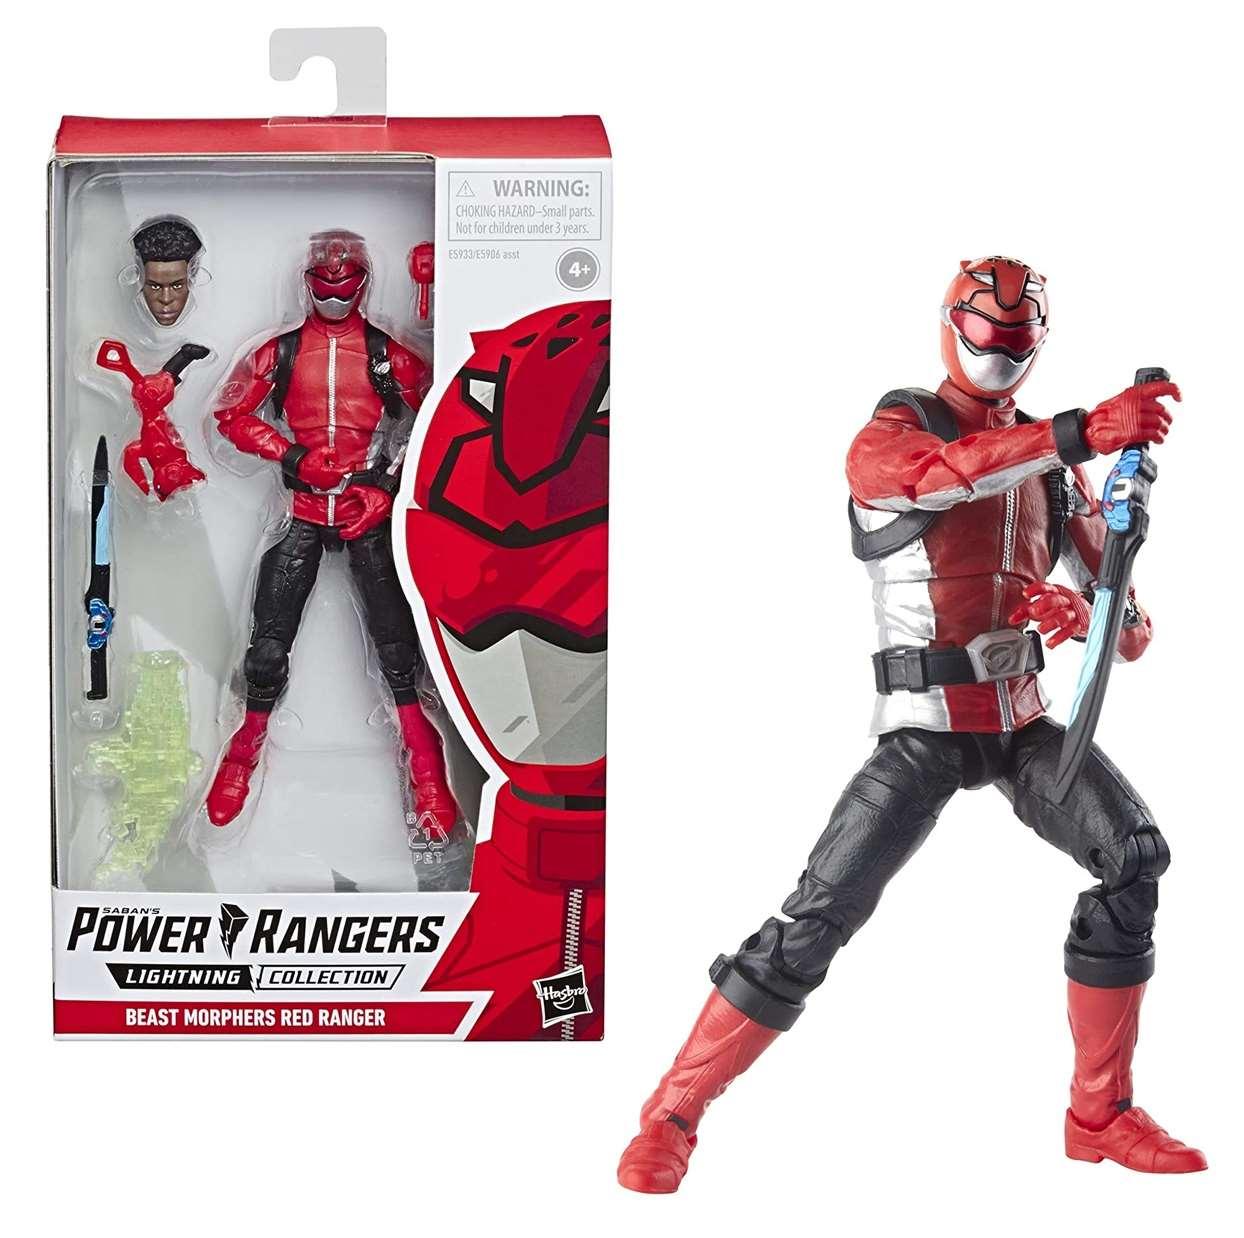 Power Rangers Lighting Collection Beast Morphers Red Ranger